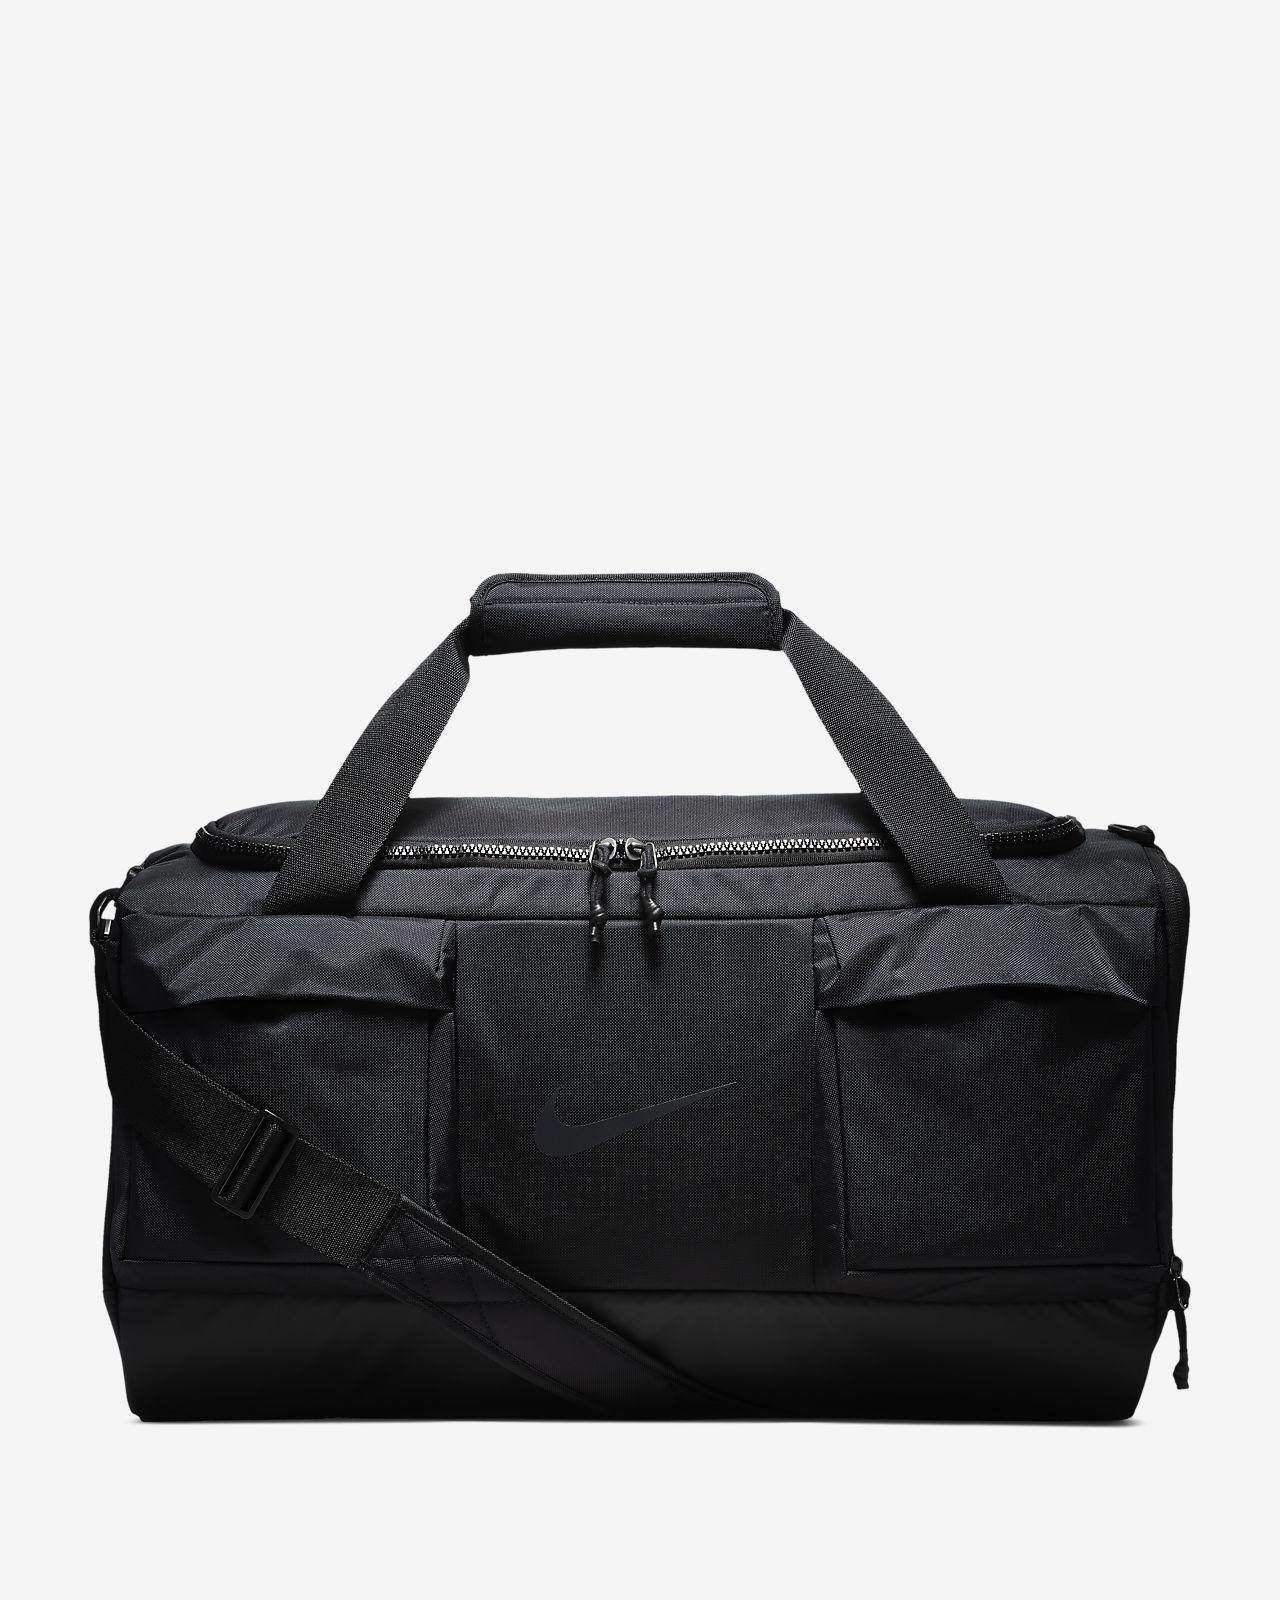 881a6058010a ... Мужская сумка-дафл для тренинга Nike Vapor Power (средний размер)